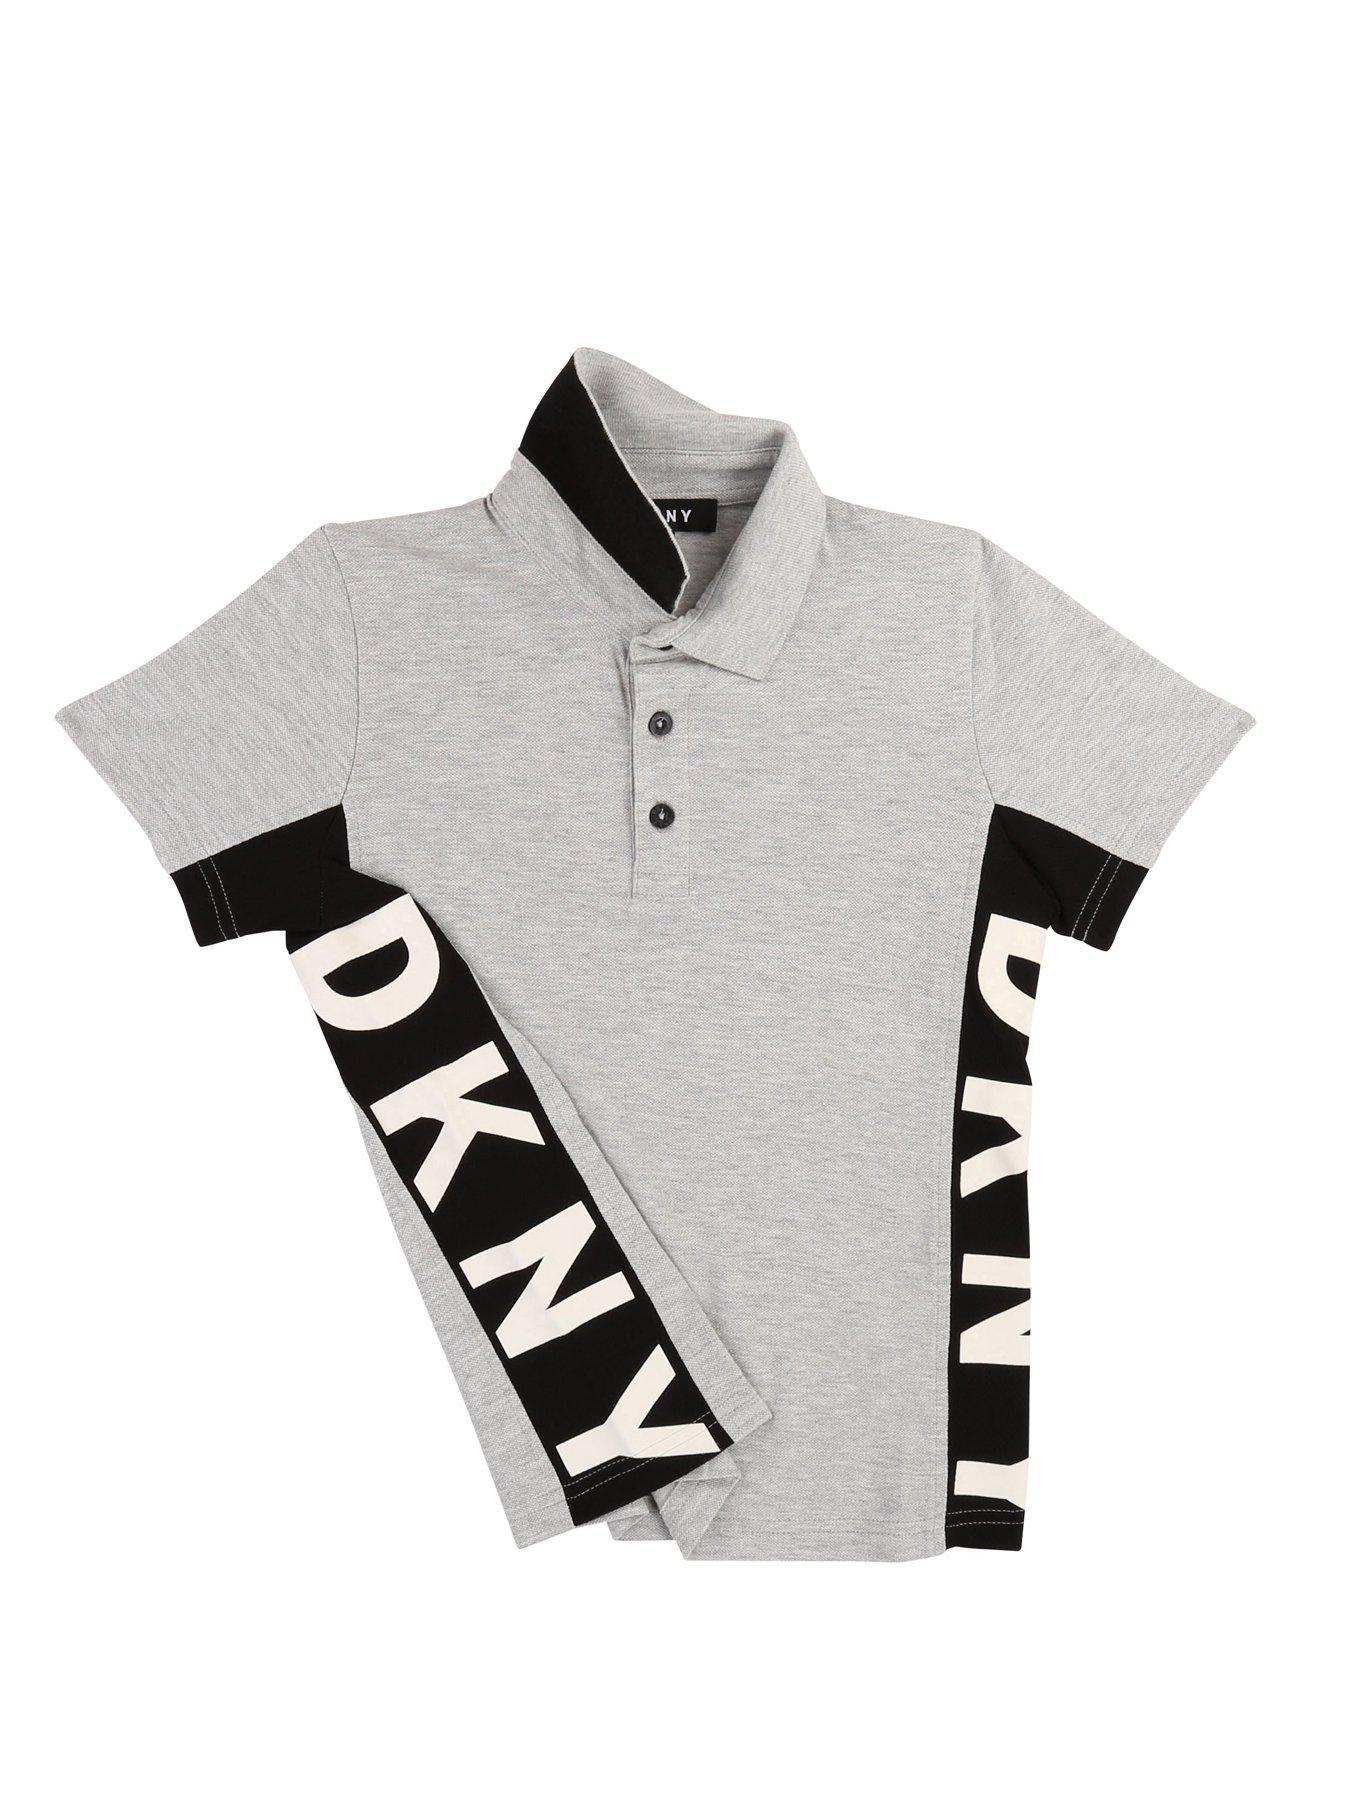 Dkny Boys Short Sleeve Side Logo Polo Shirt Grey, Grey